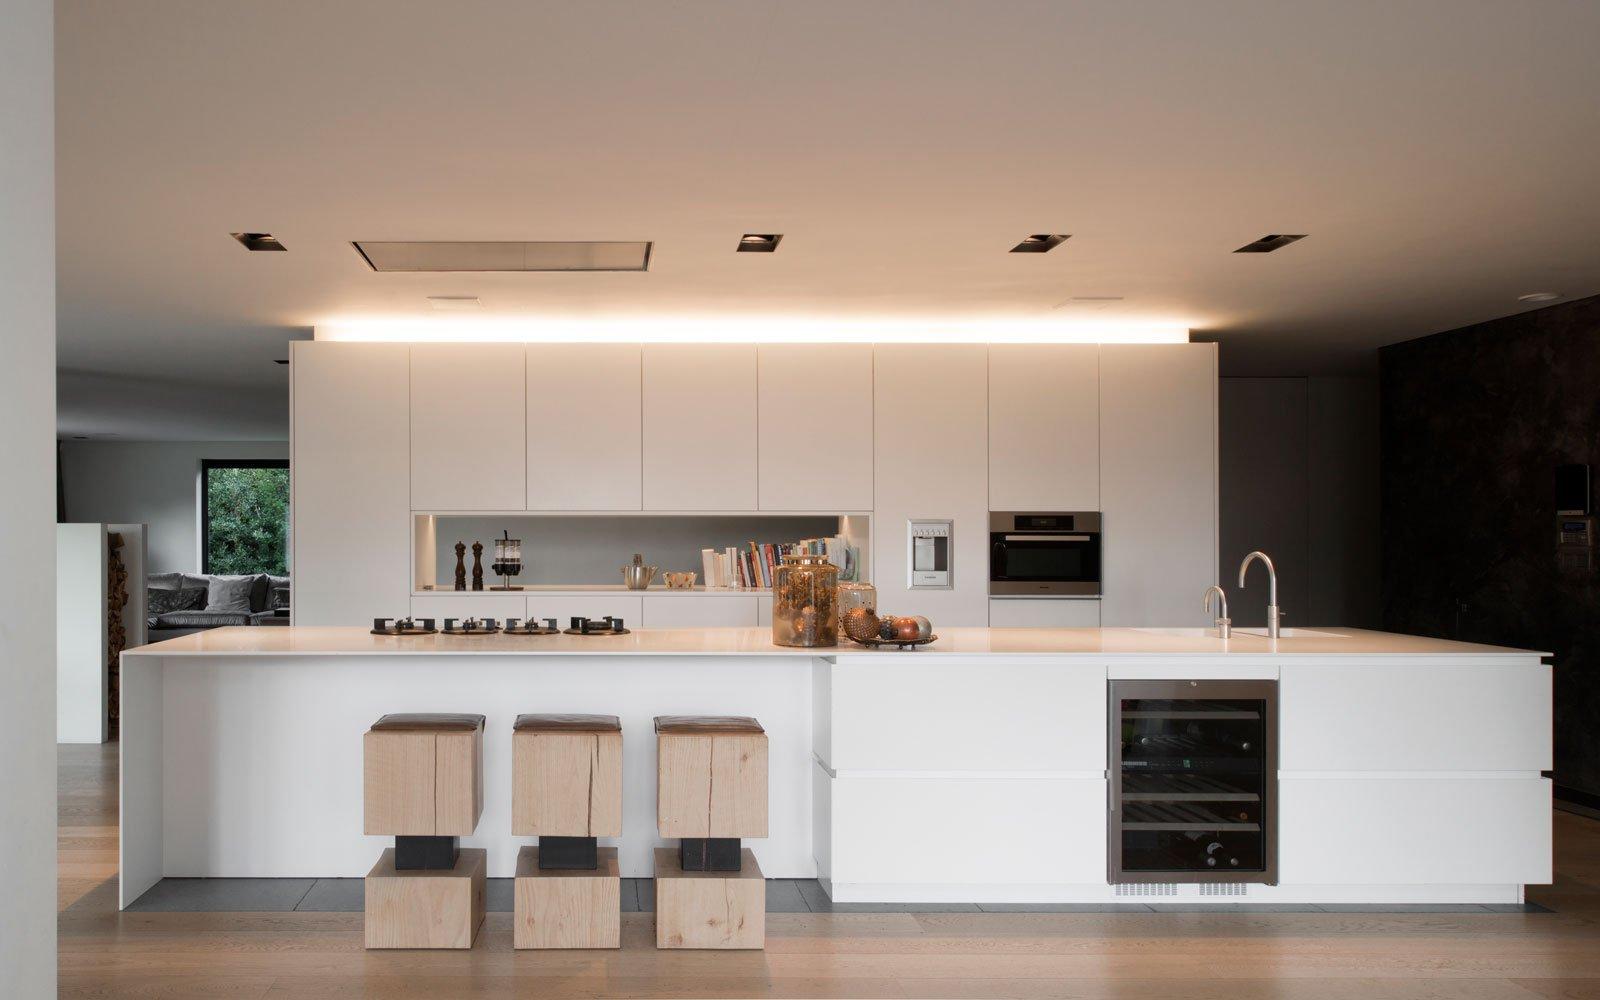 Maatwerk keuken, Vado Keukens, kookeiland, wit, moderne villa, VVR Architecten